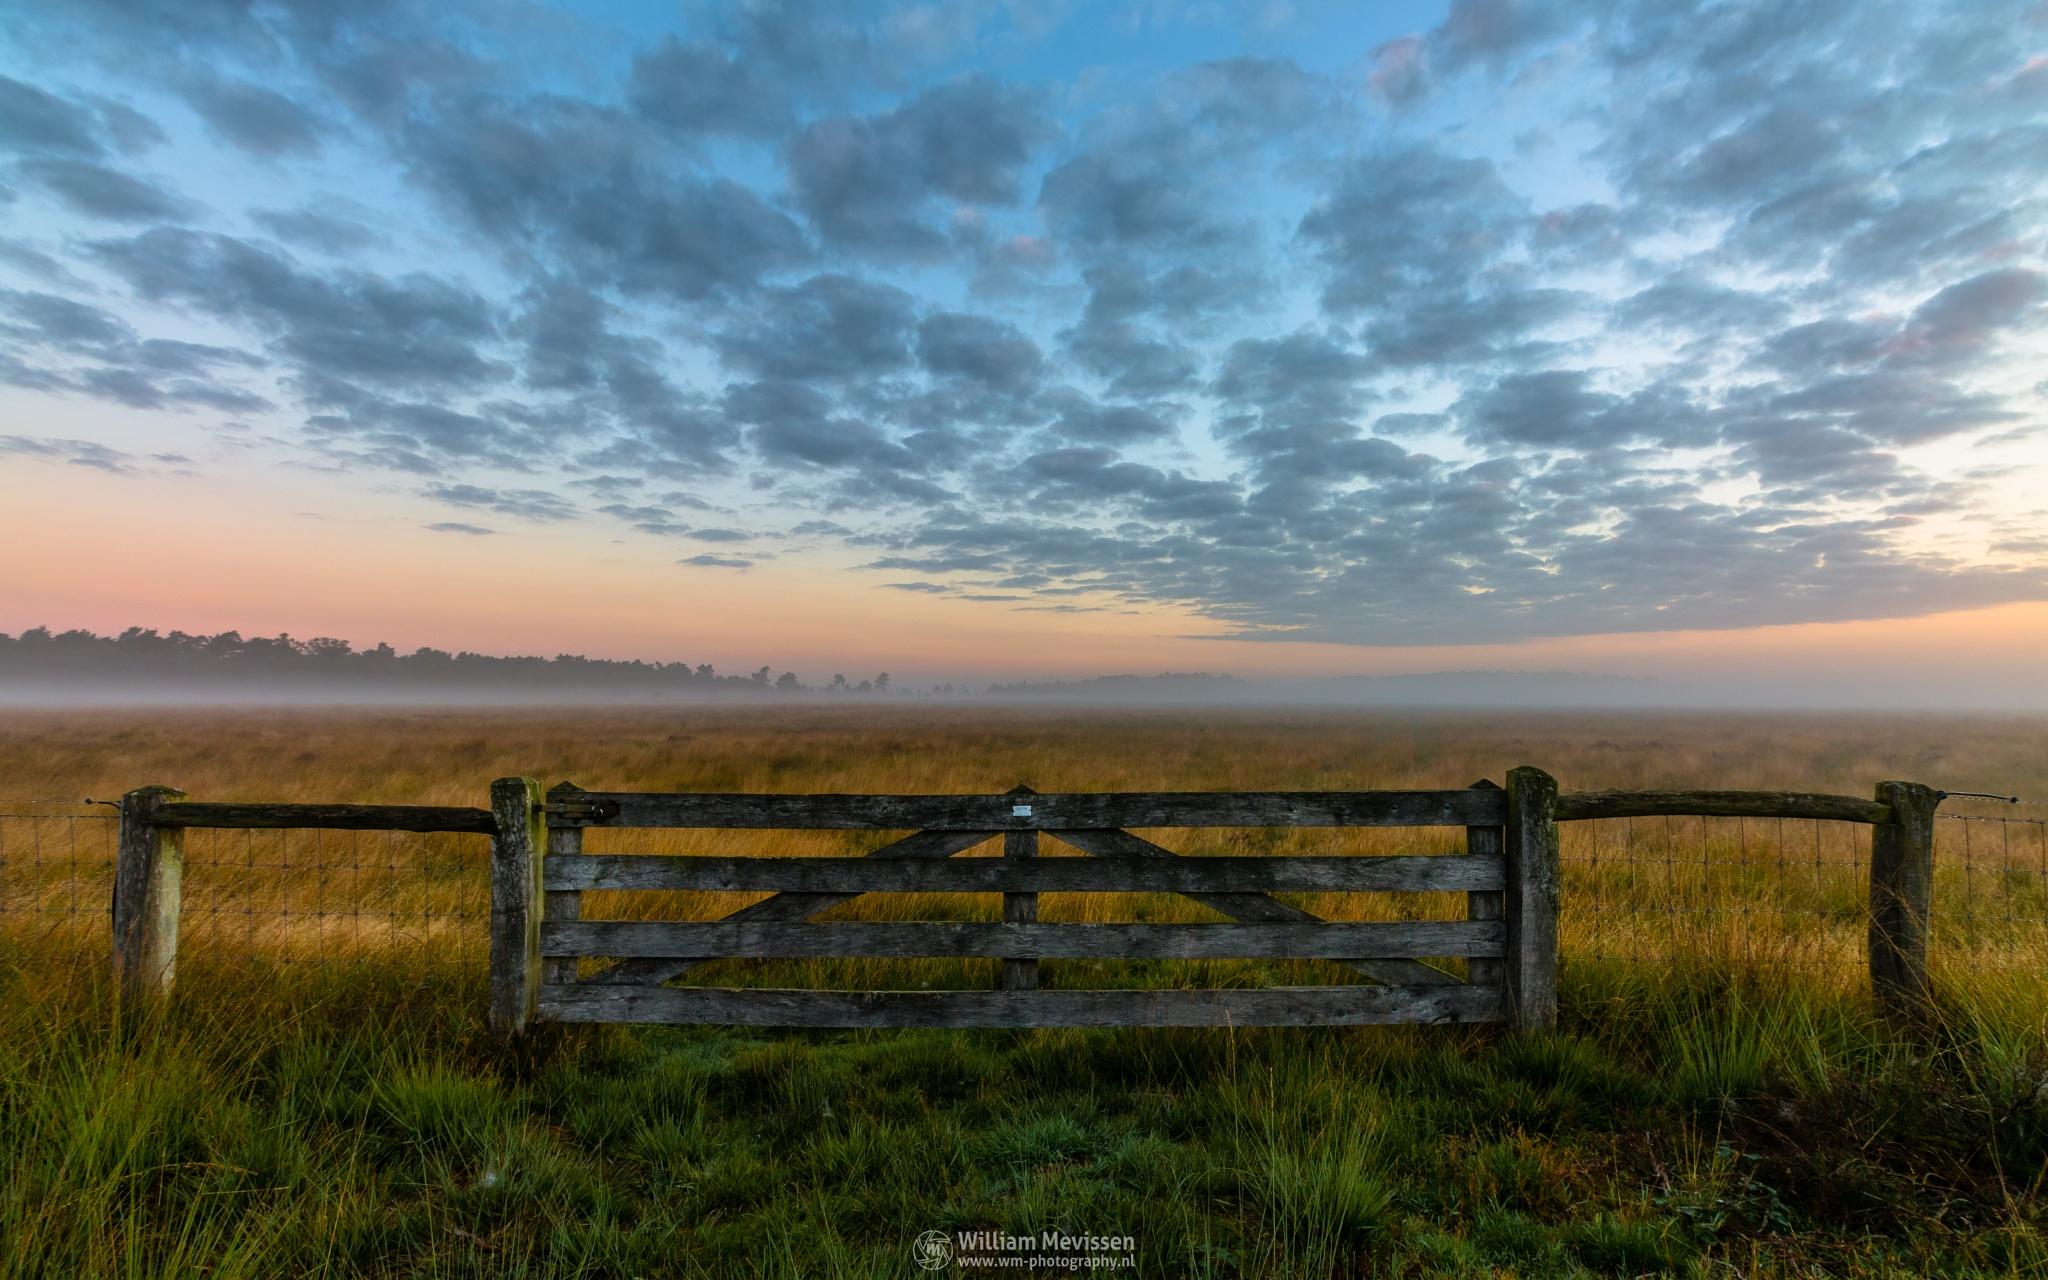 Misty Morning Gate by William Mevissen